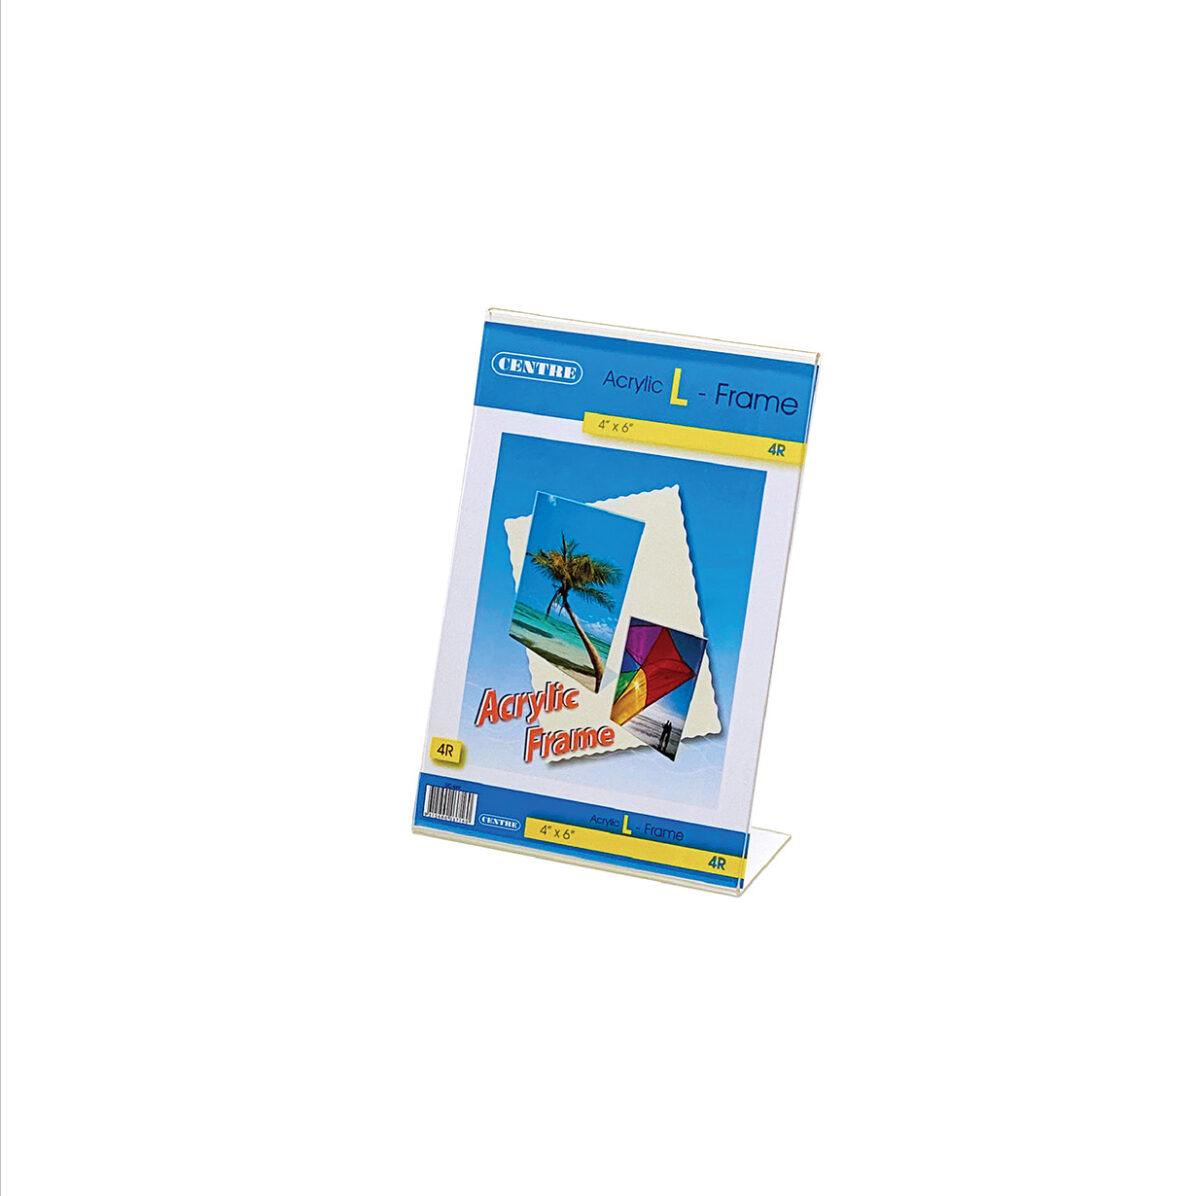 Centre Acrylic Picture Frame - L Stand Portrait 4R